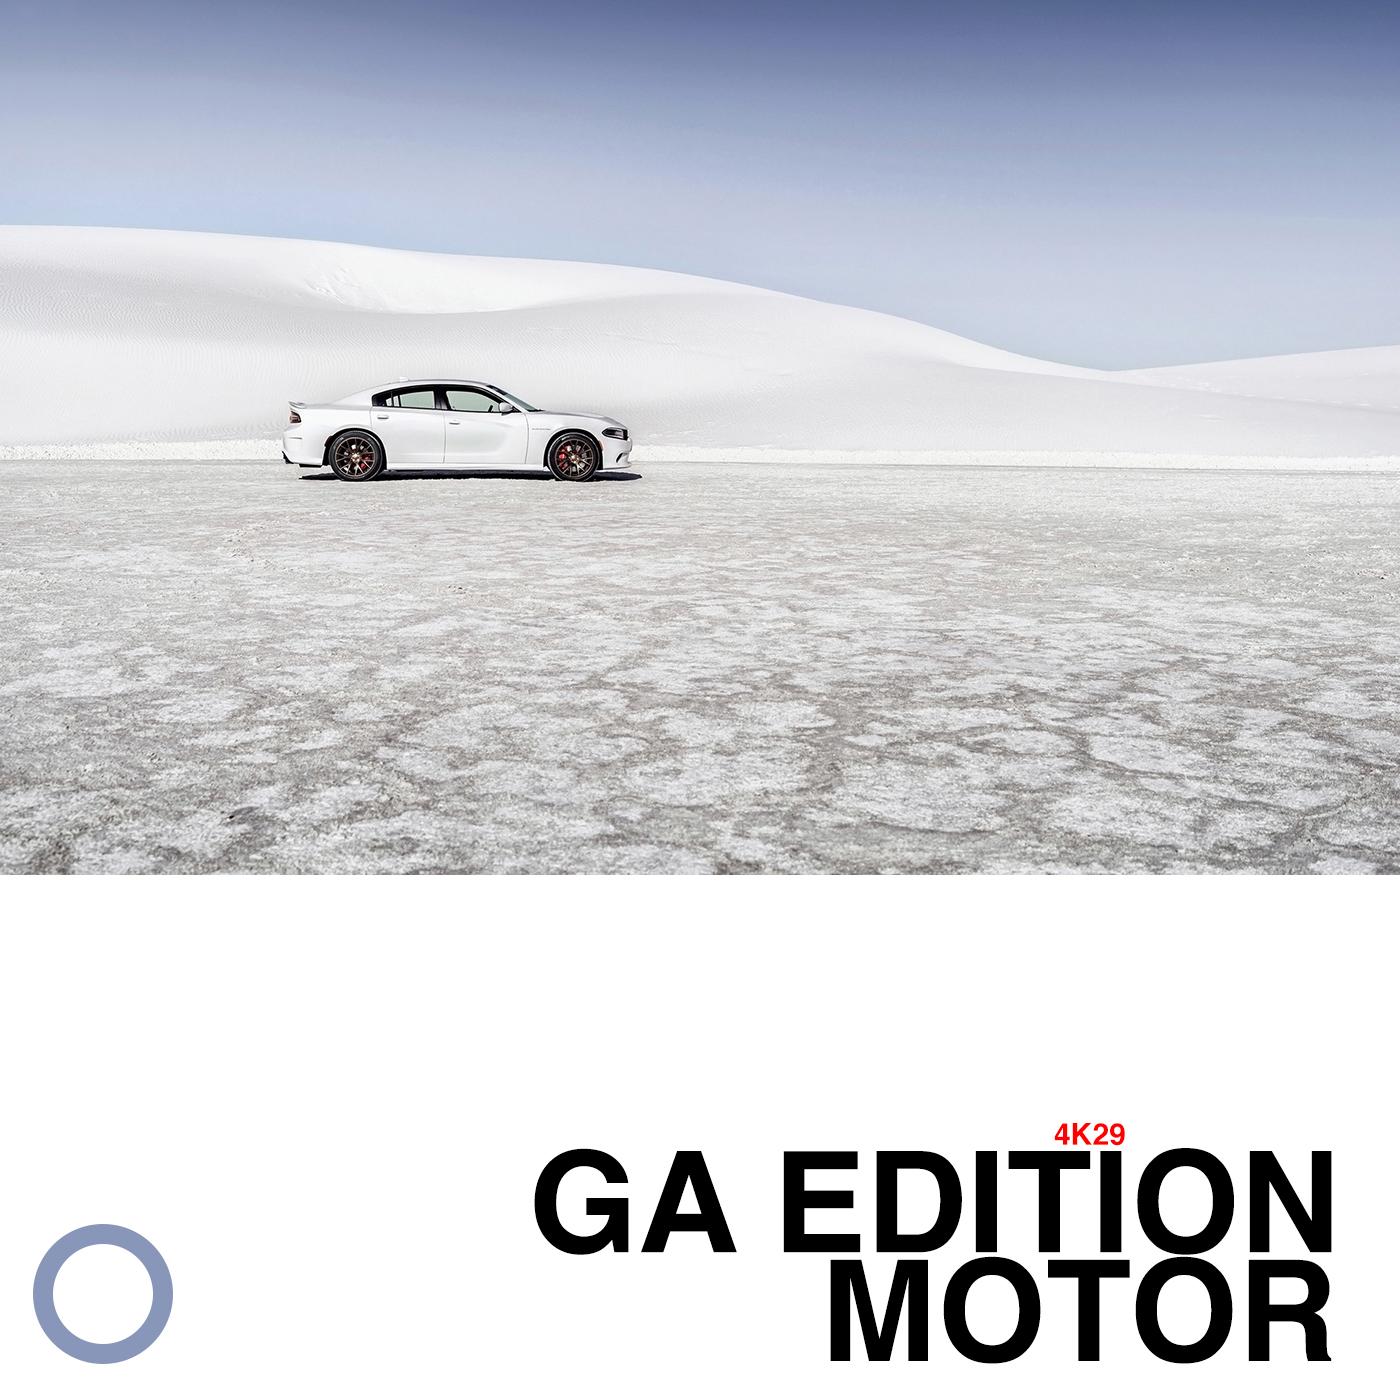 GA EDITION MOTOR 4K29